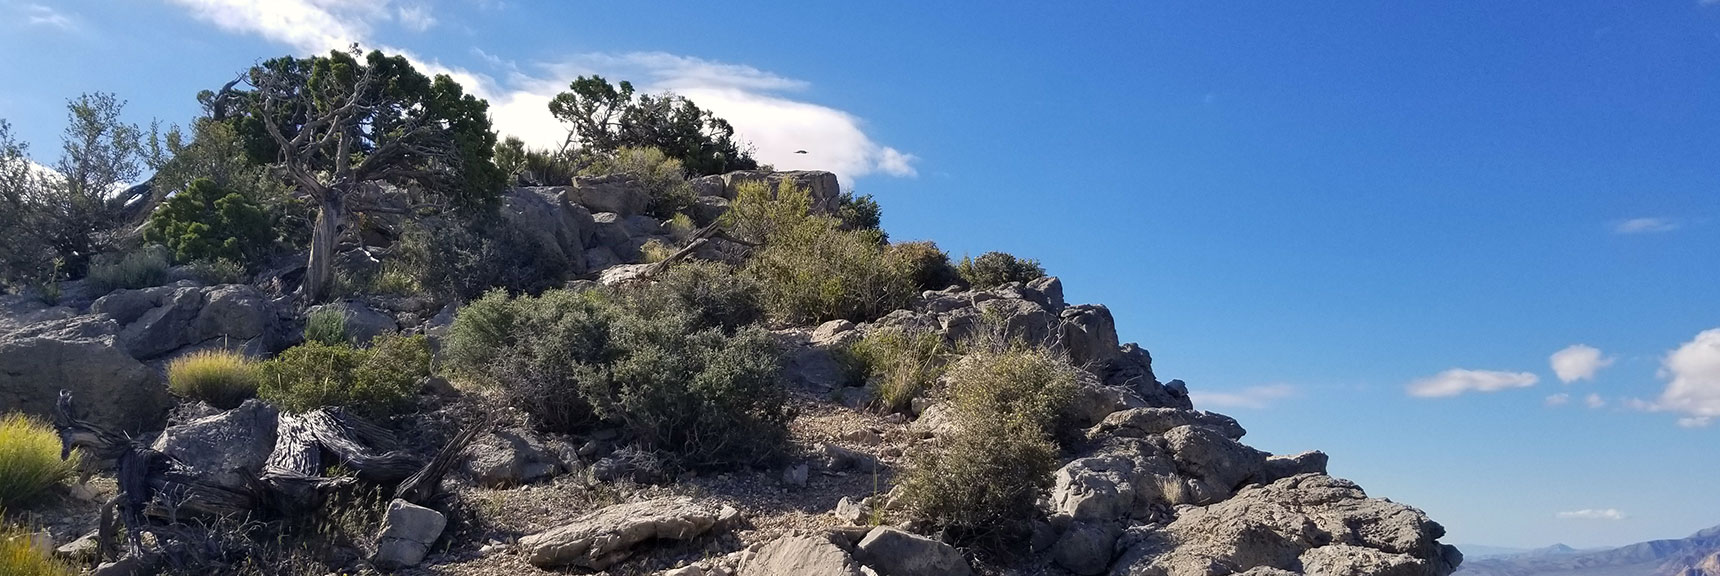 Turtlehead Peak Summit in Red Rock Park, Nevada